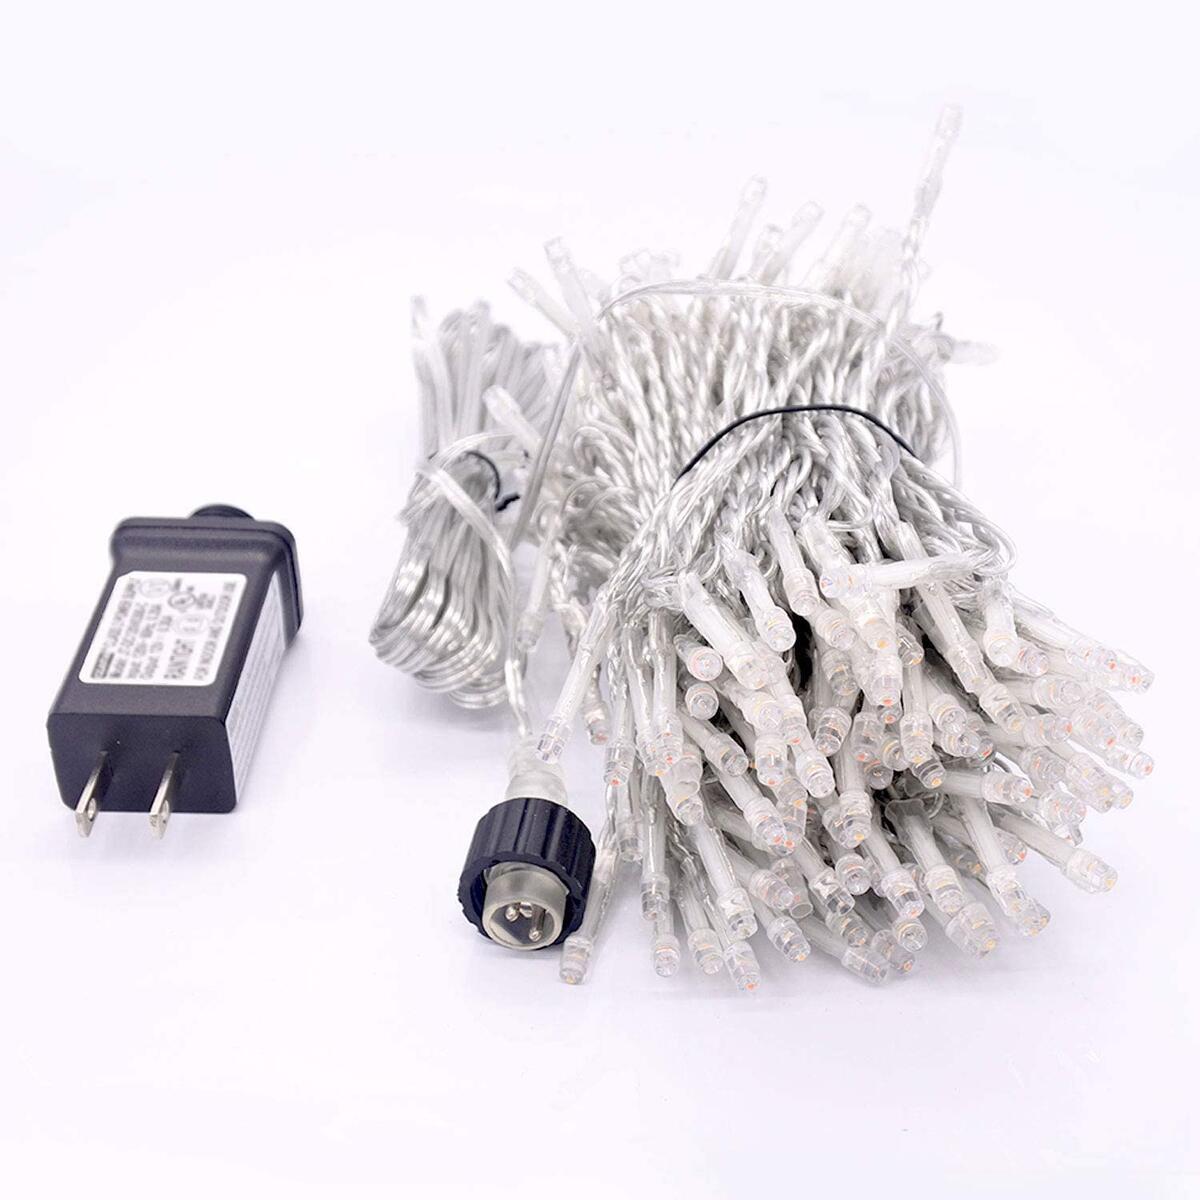 RULER Extendable String Lights, Waterproof Fairy Light 8 Modes 100 LED 49.2 Feet String Lights Plug in 24V Super Safe Voltage for Indoor/Outdoor, Bedroom, Patio, Wedding, Party (Warm White)